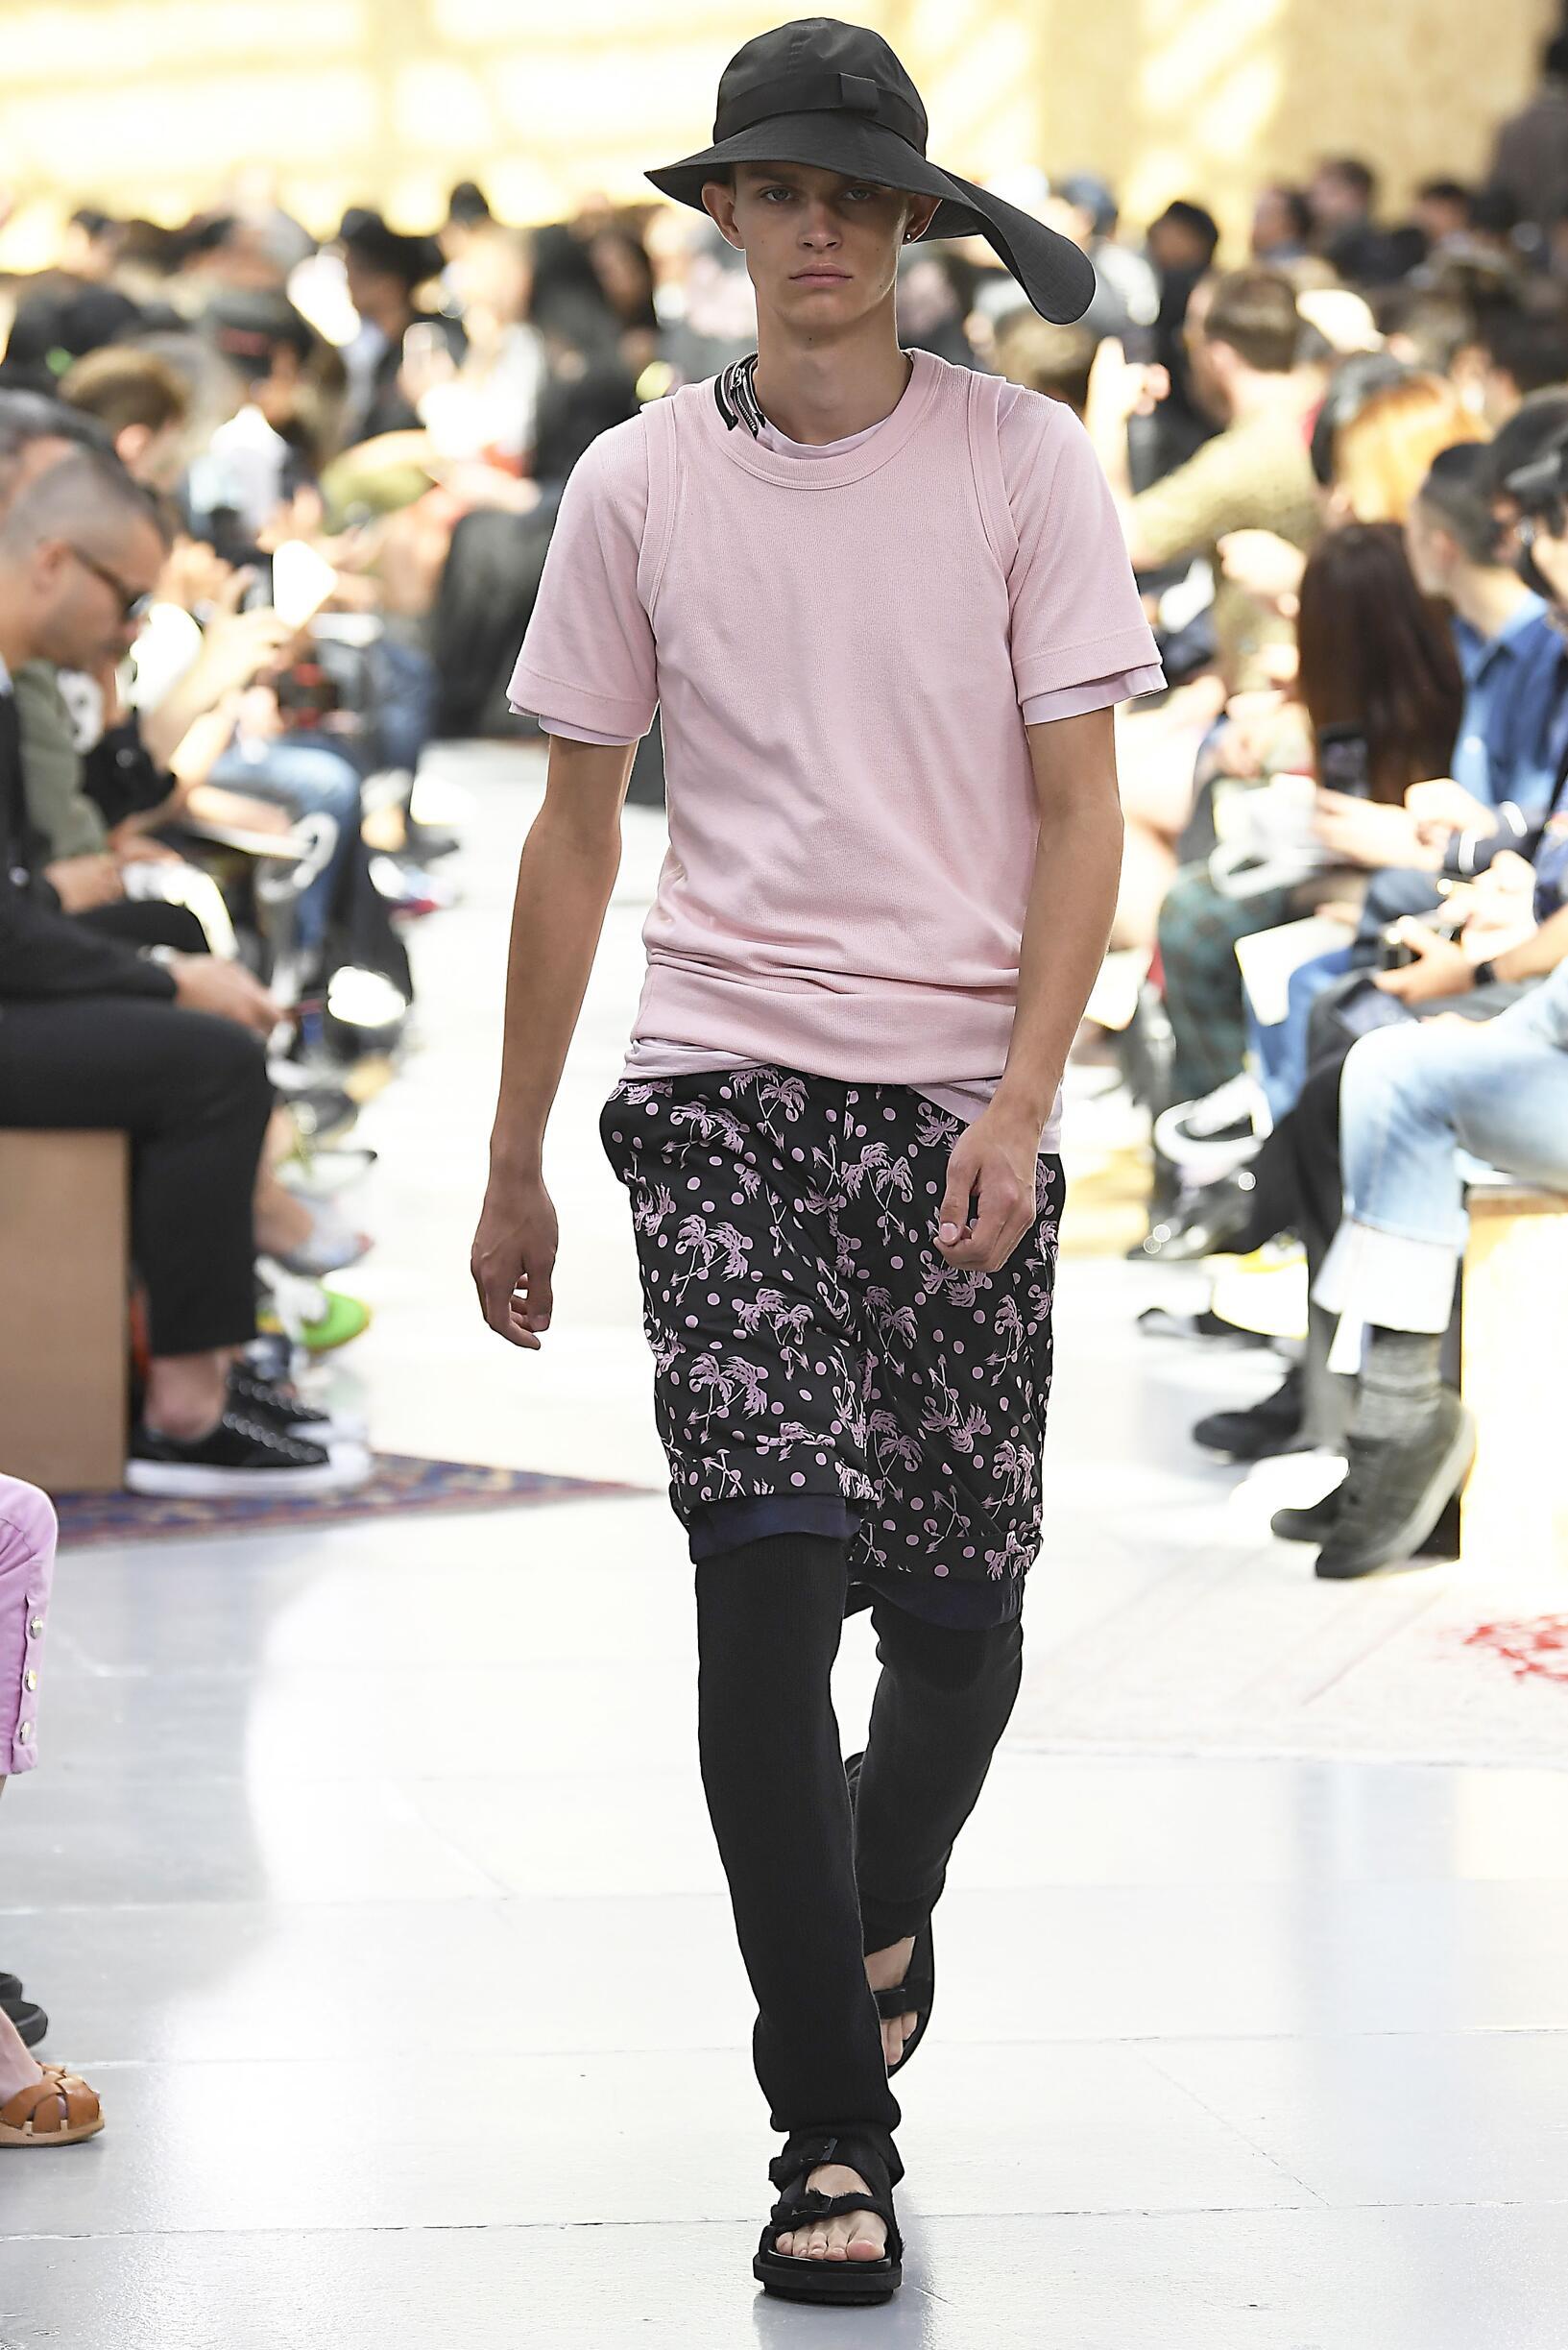 Man SS 2020 Sacai Show Paris Fashion Week